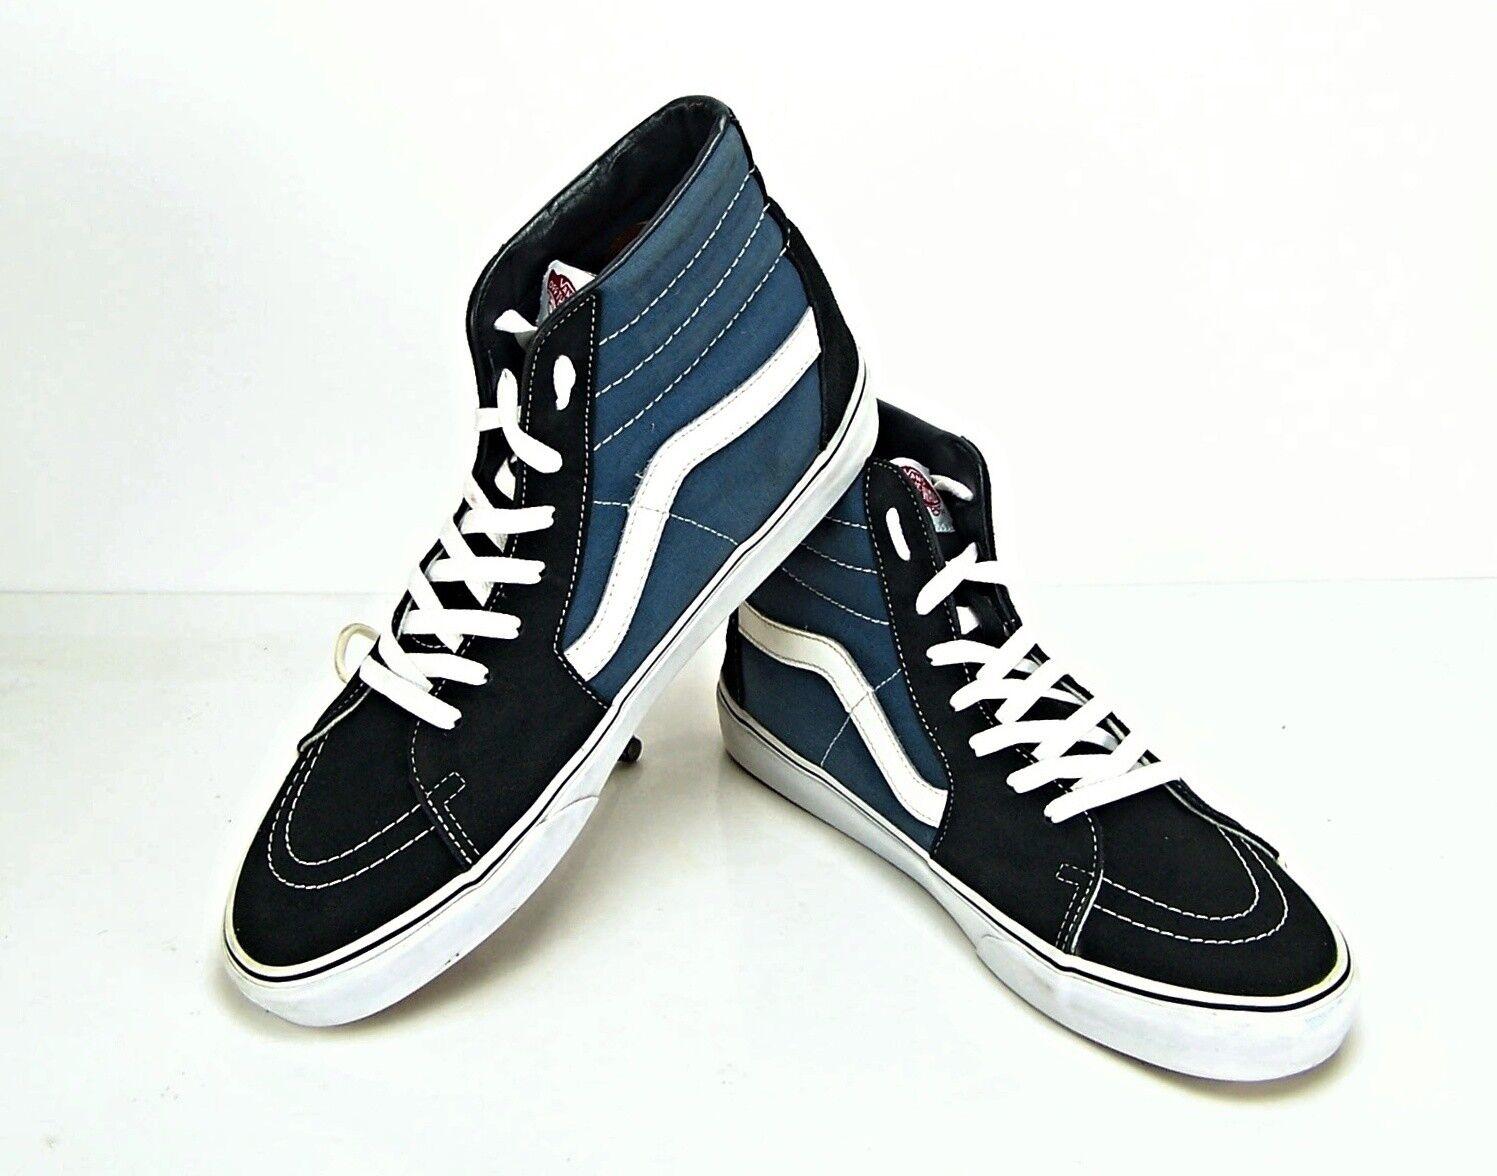 Vans SK8 Hi Tops Black High Blue Mens Size 13 High Black Top Trainers Excellent Condition 0c33bd